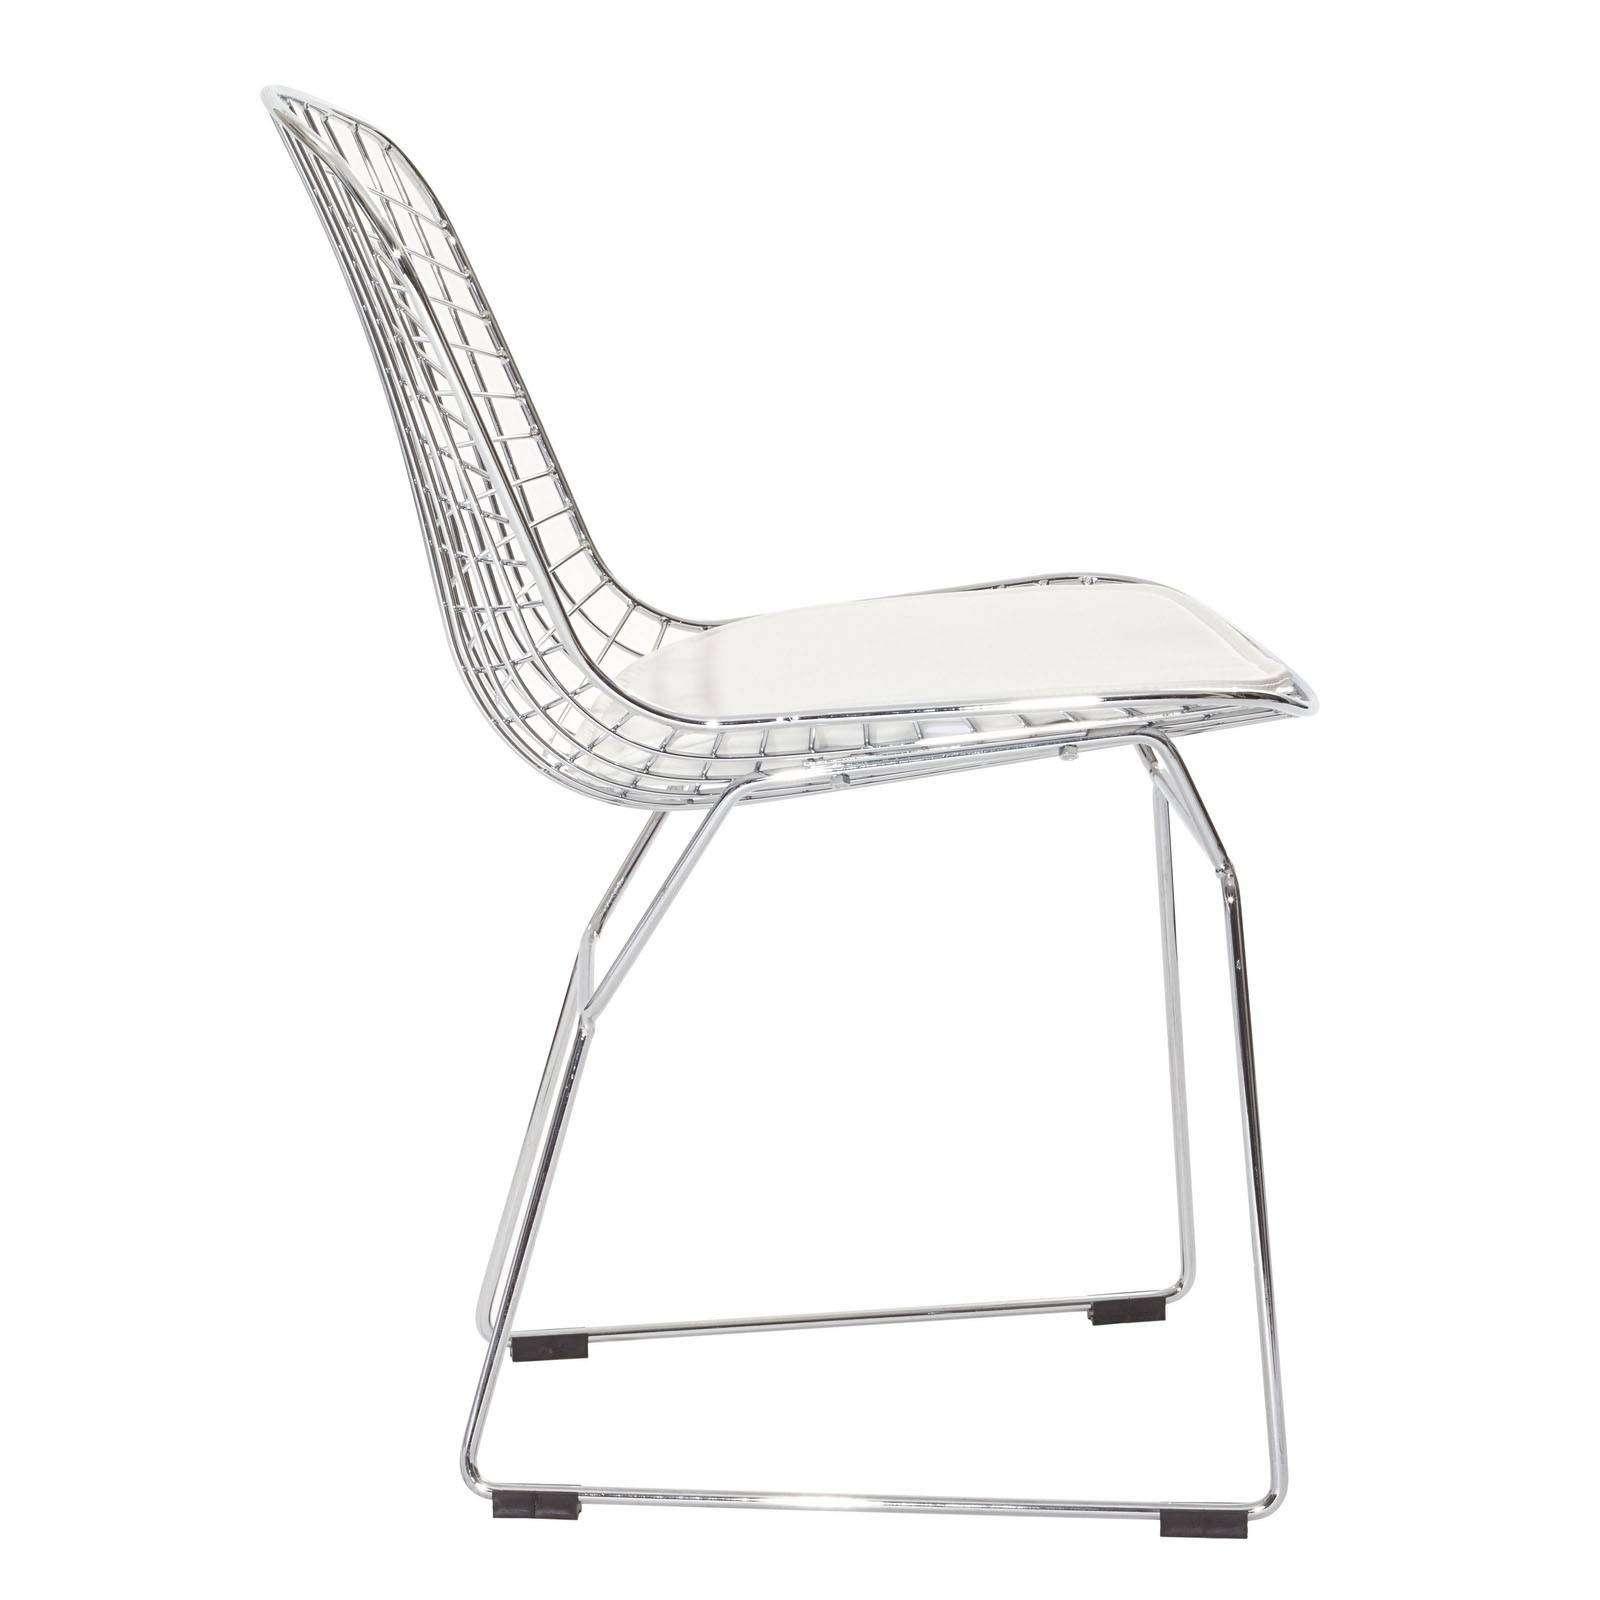 bertoia style chair. Bertoia Style Chair